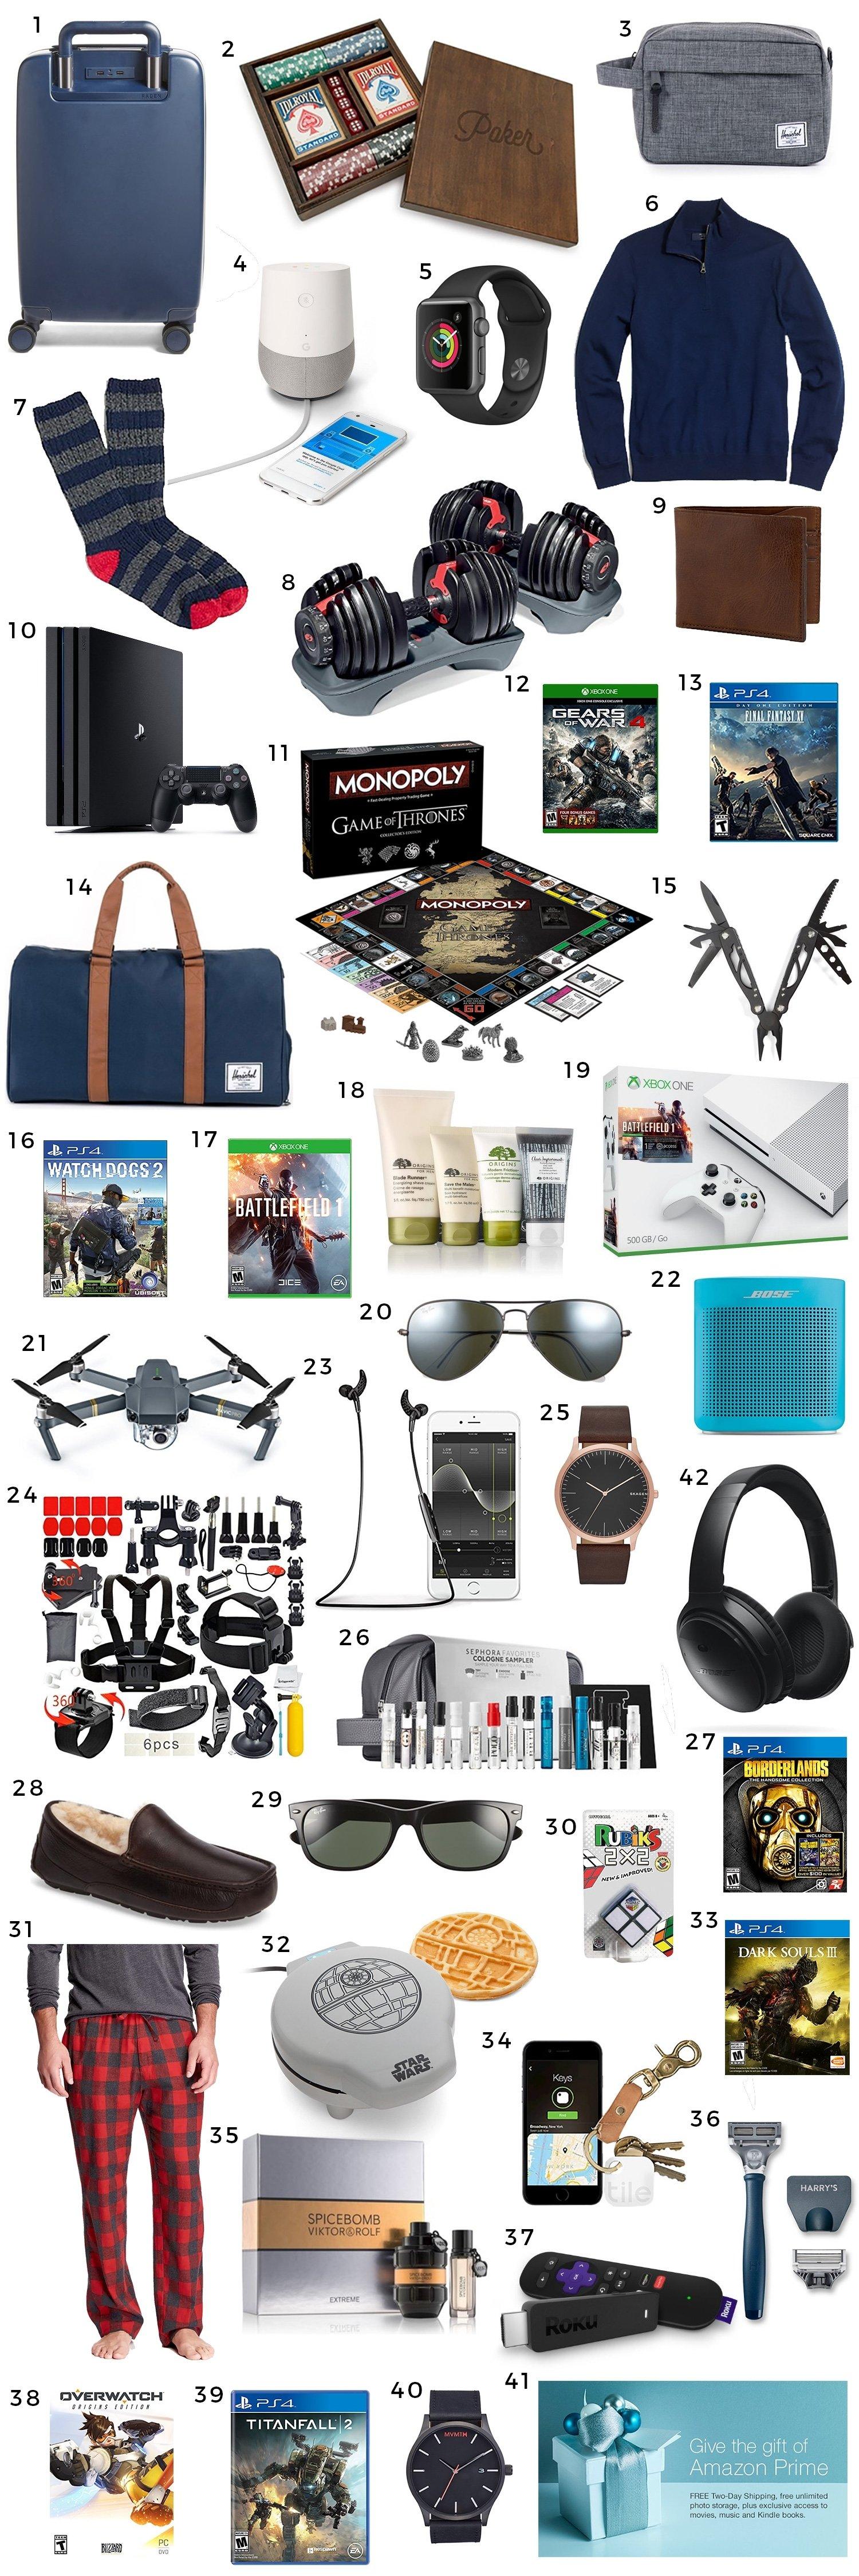 10 Elegant Christmas Gift Ideas For Men 2013 marvelous xmas presents for men 31 kari 7 11 copy anadolukardiyolderg